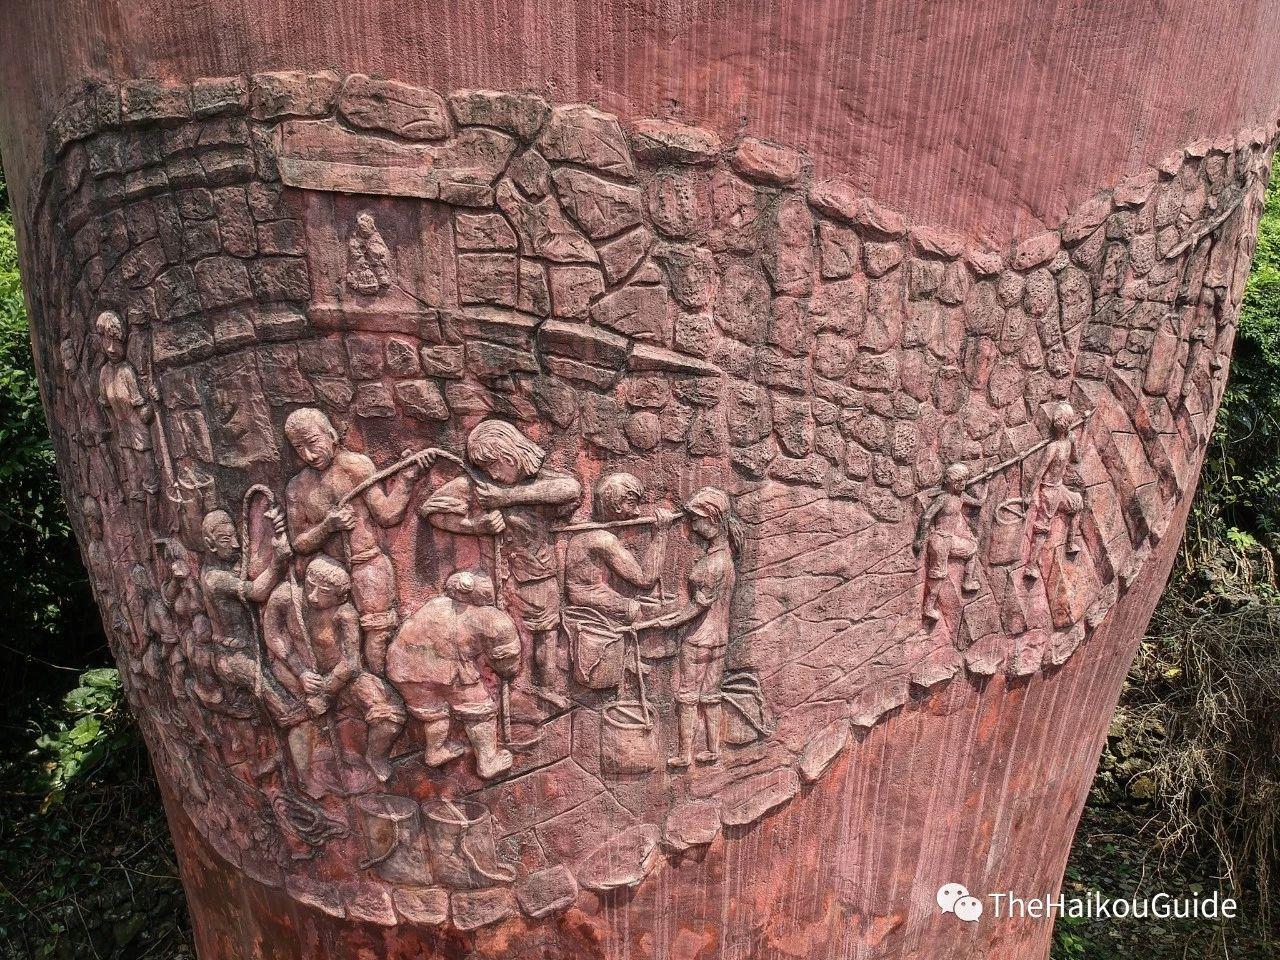 Mei Guan village ancestral temple 8